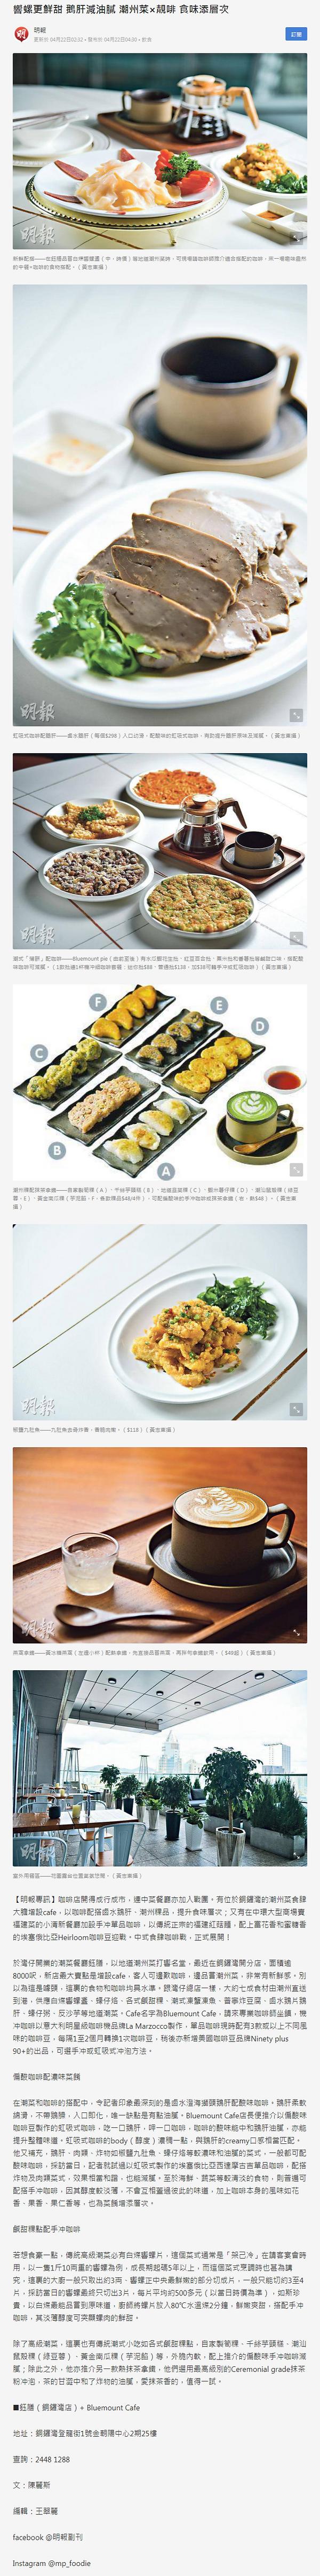 mingpao_newspaper.png